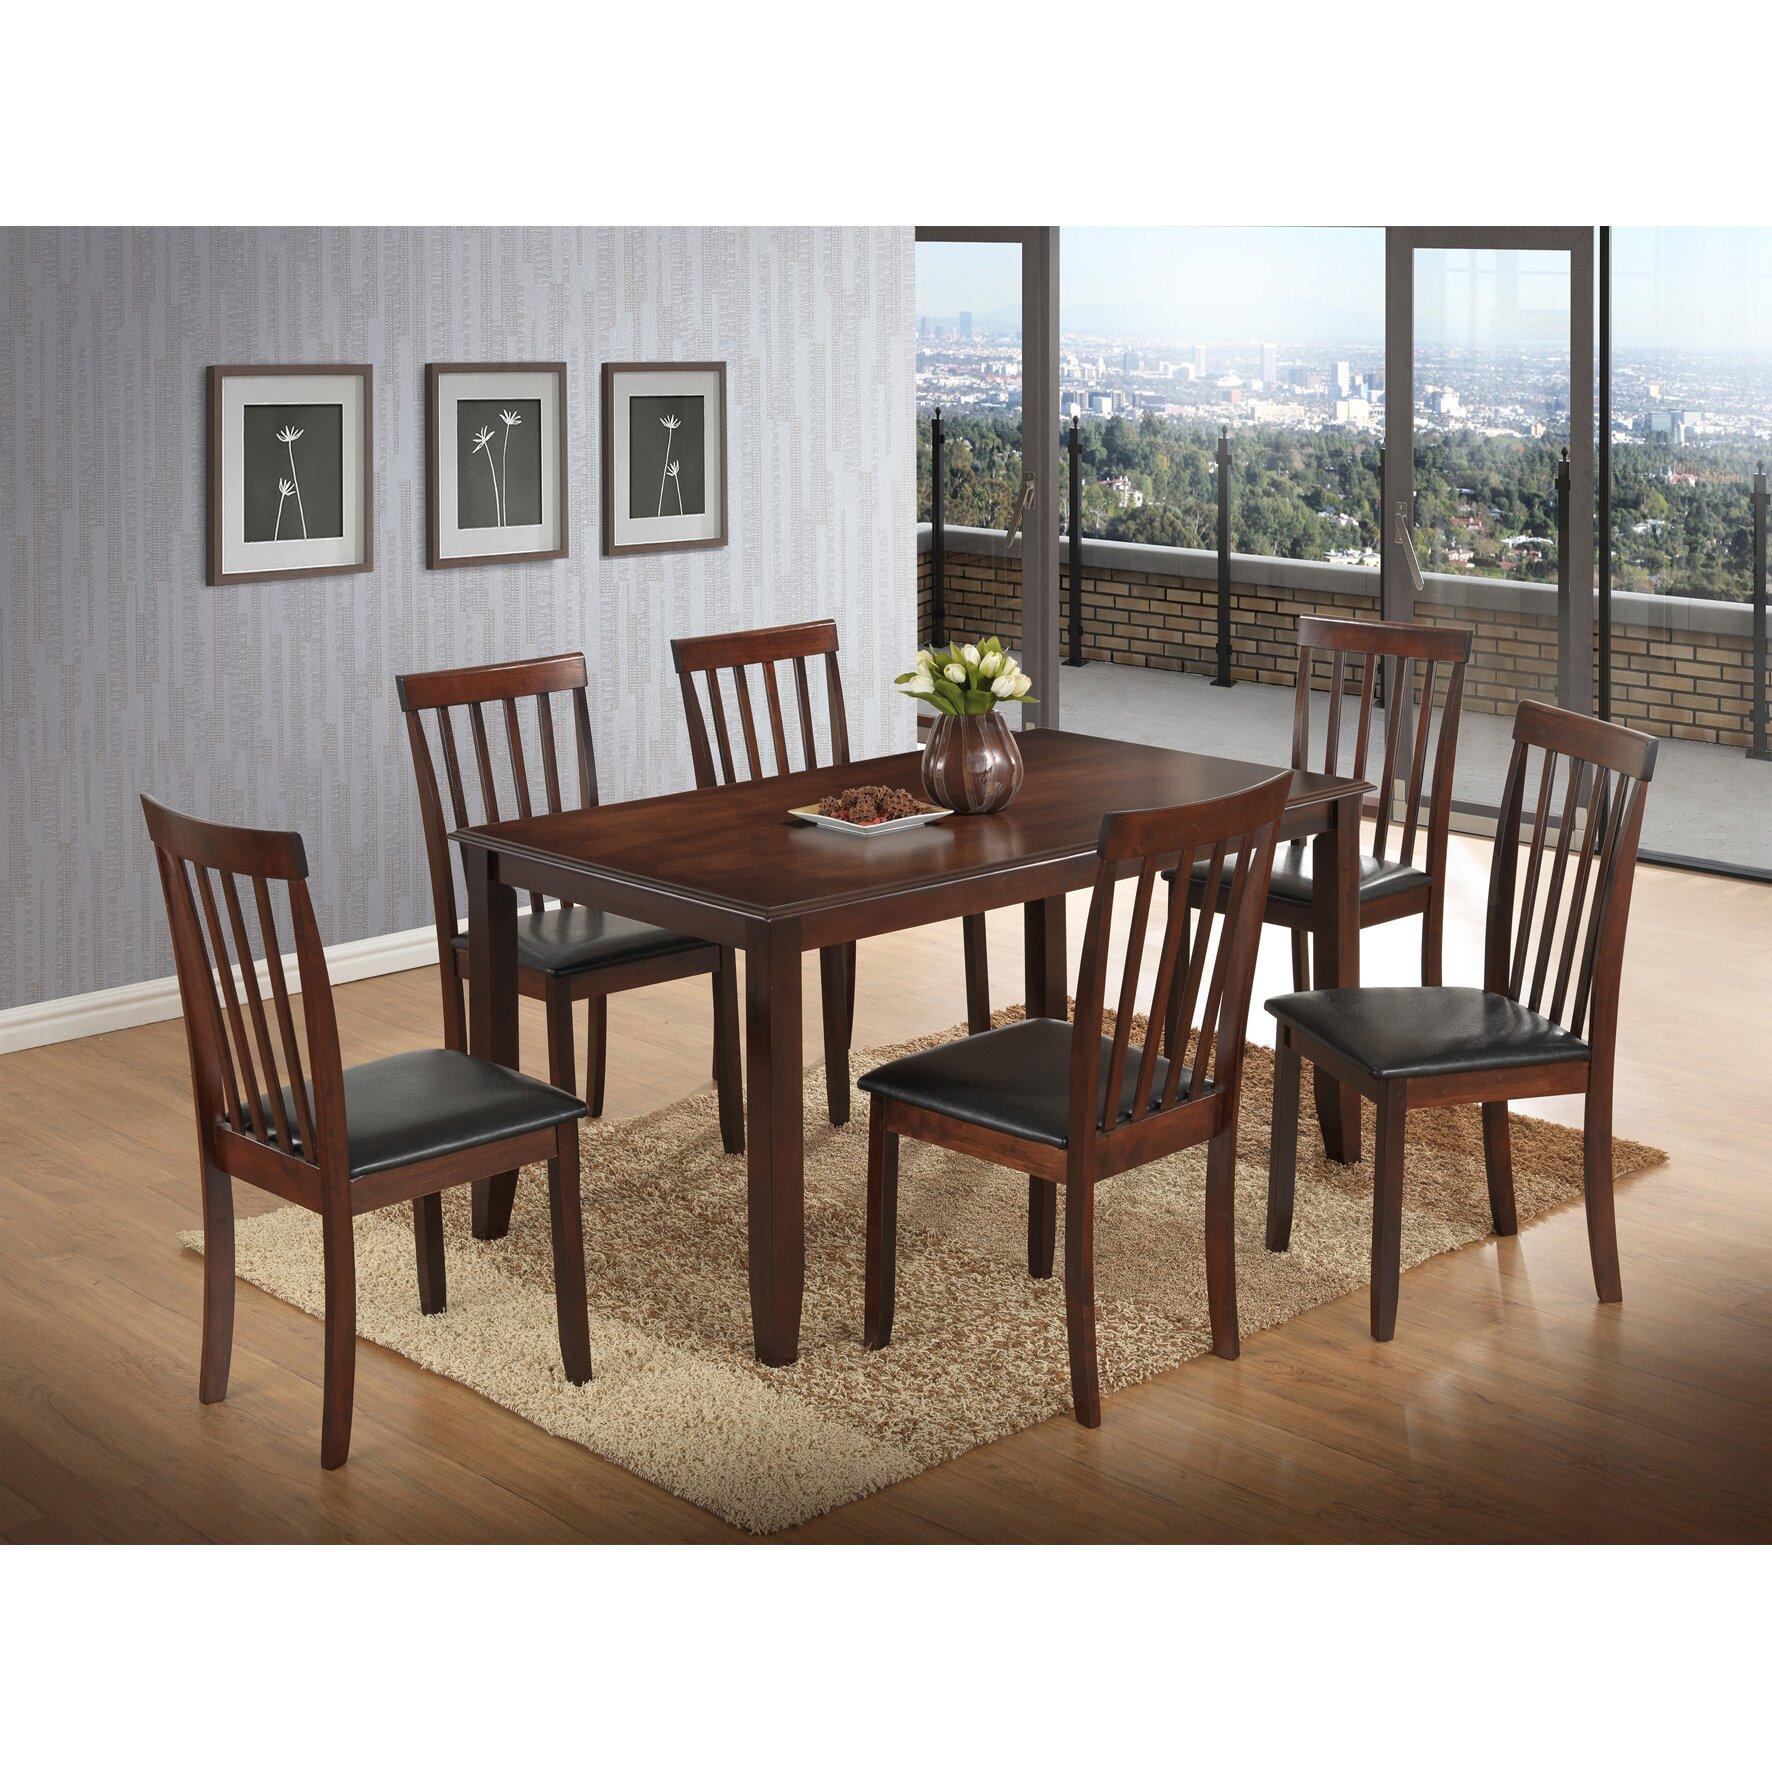 Best Quality Furniture  Piece Dining Set  Reviews Wayfair - Best quality dining room furniture